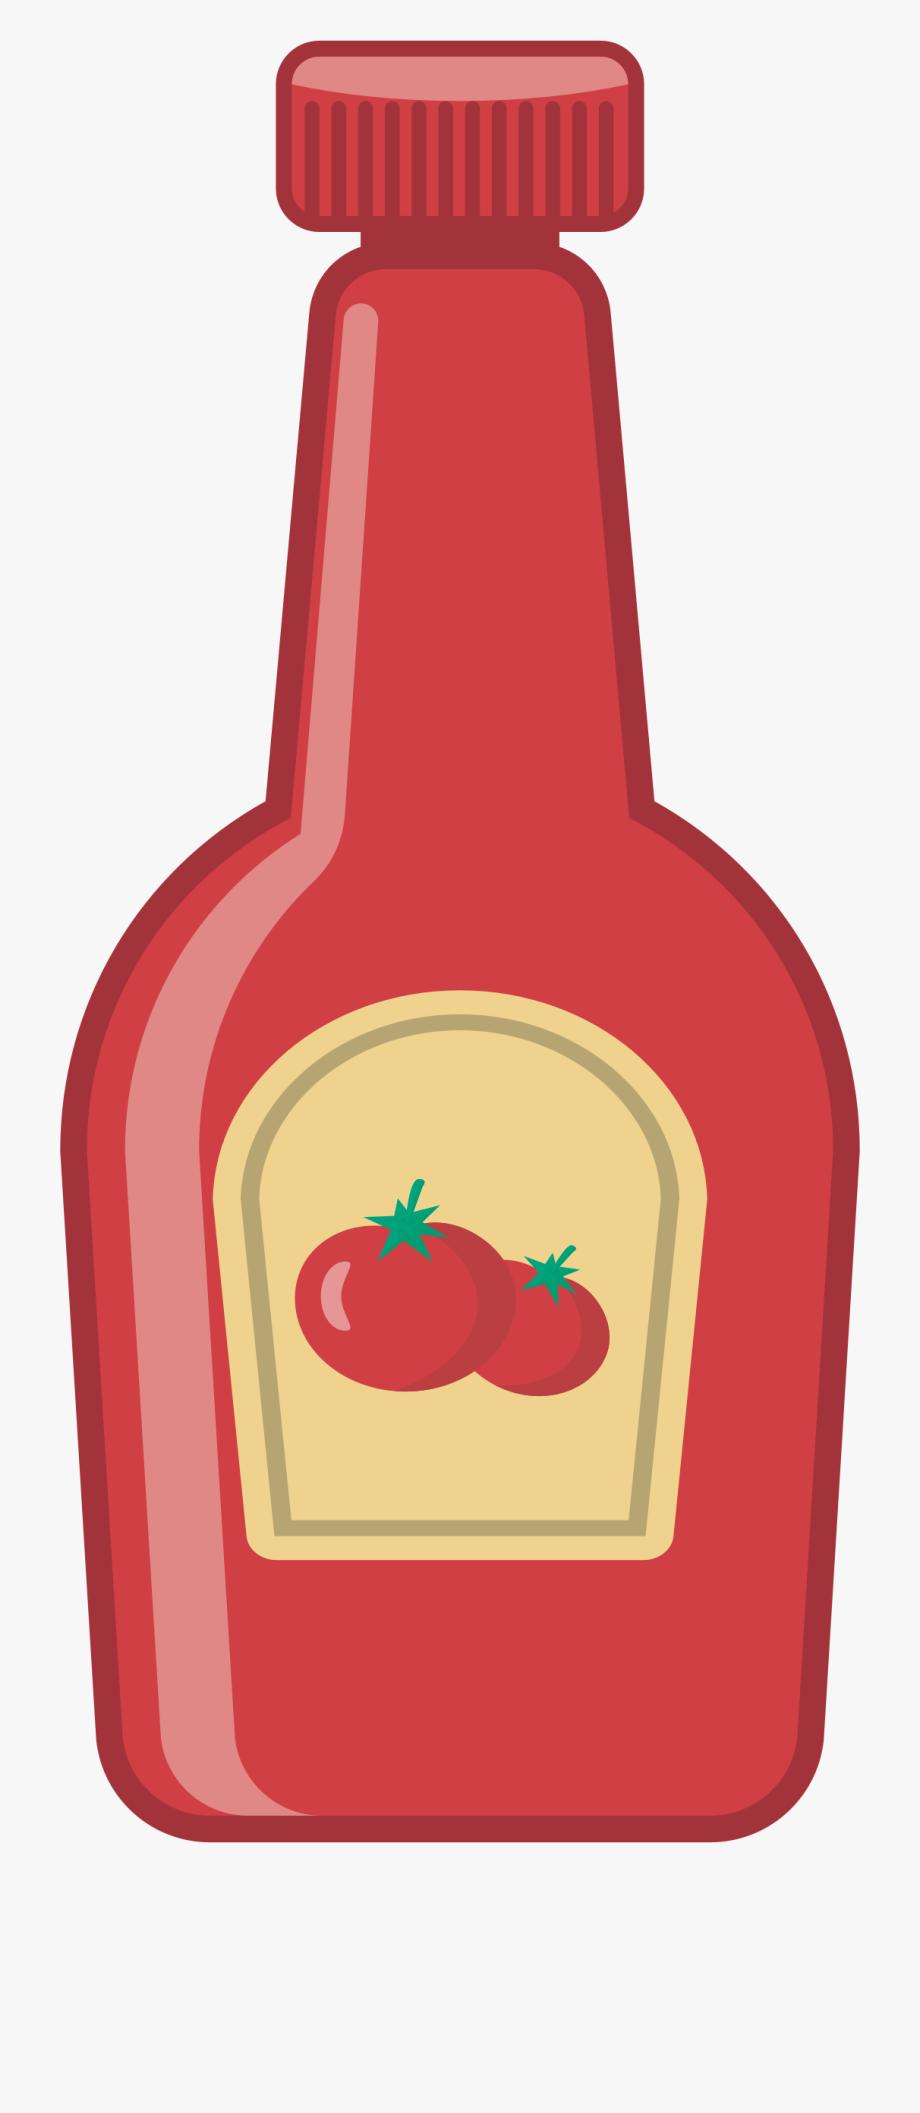 Ketchup clipart jar. Tomato sauce transparent background